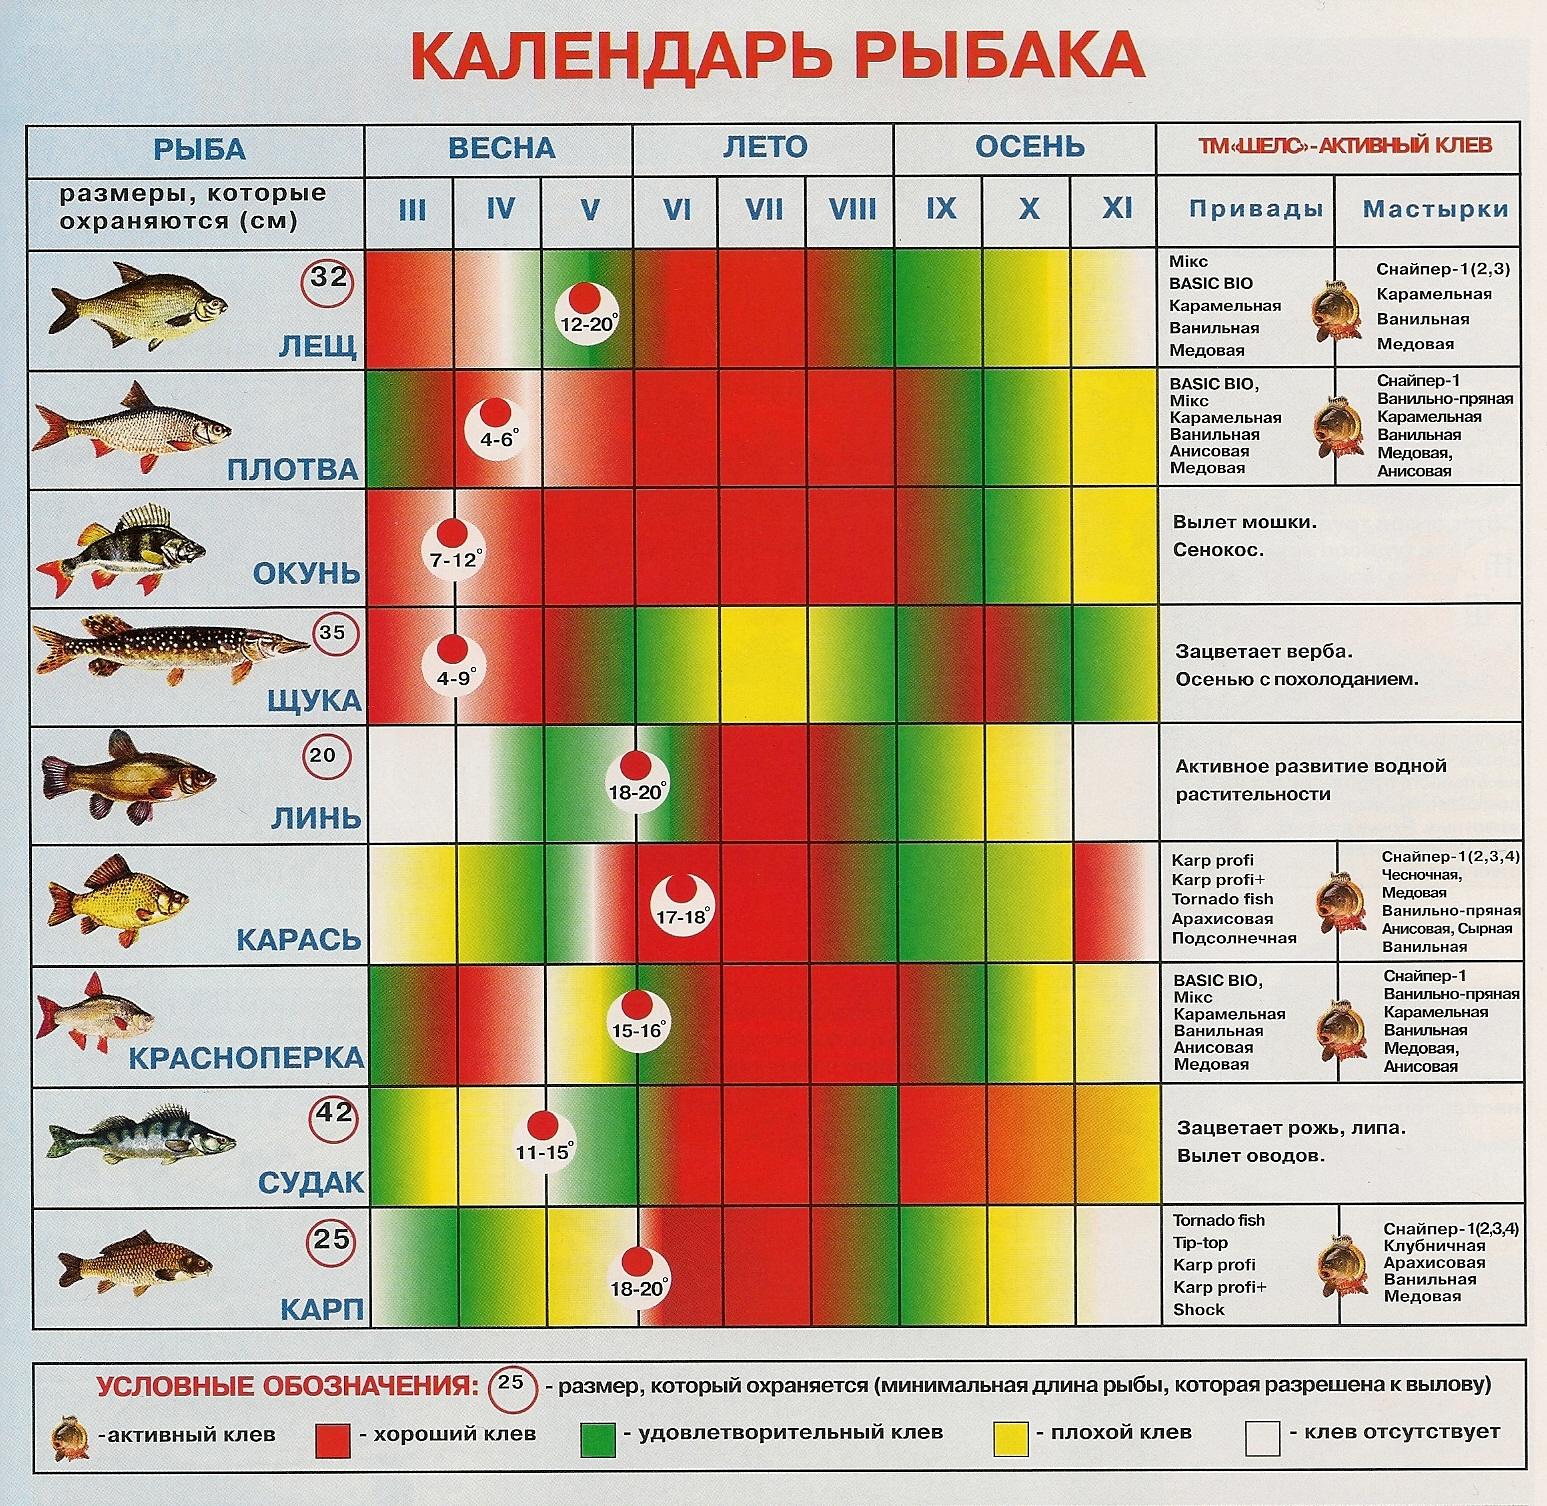 все о рыбалке календарь клева